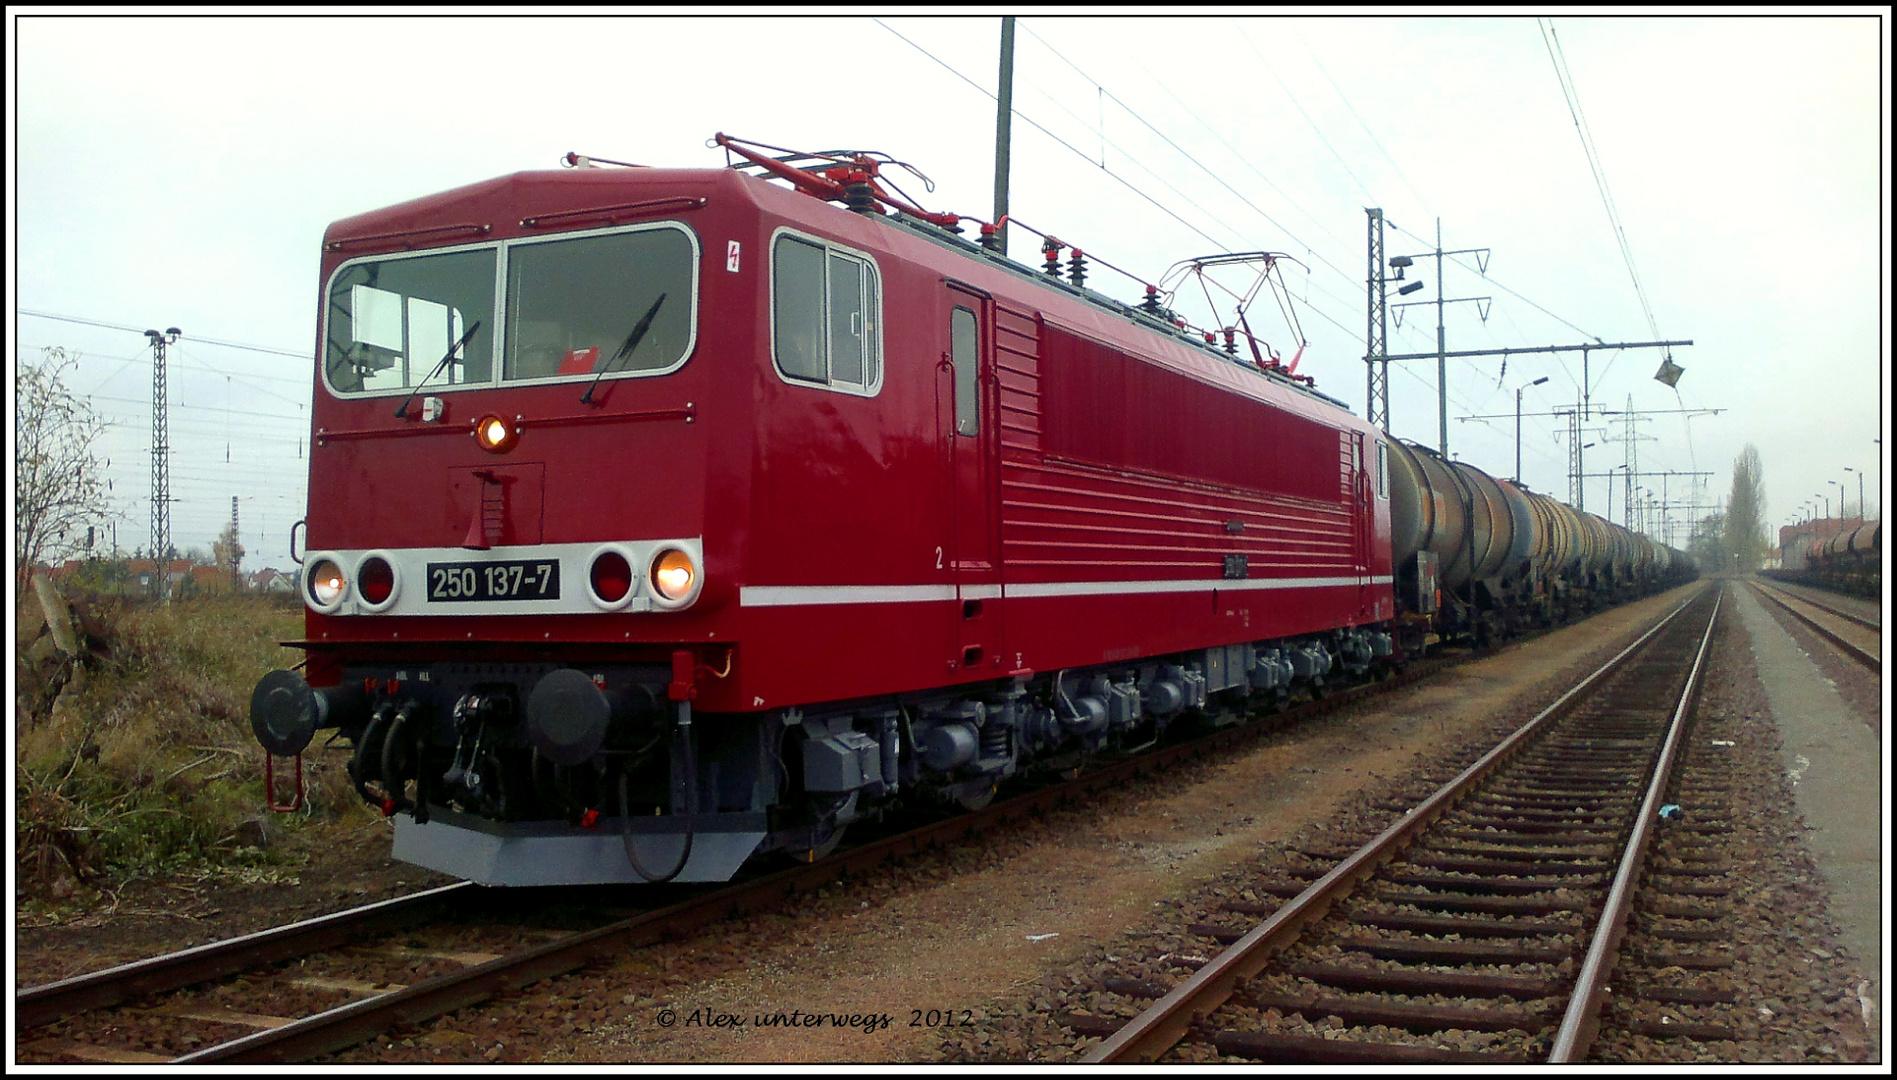 Alex mit 250 137 in Magdeburg Rothensee